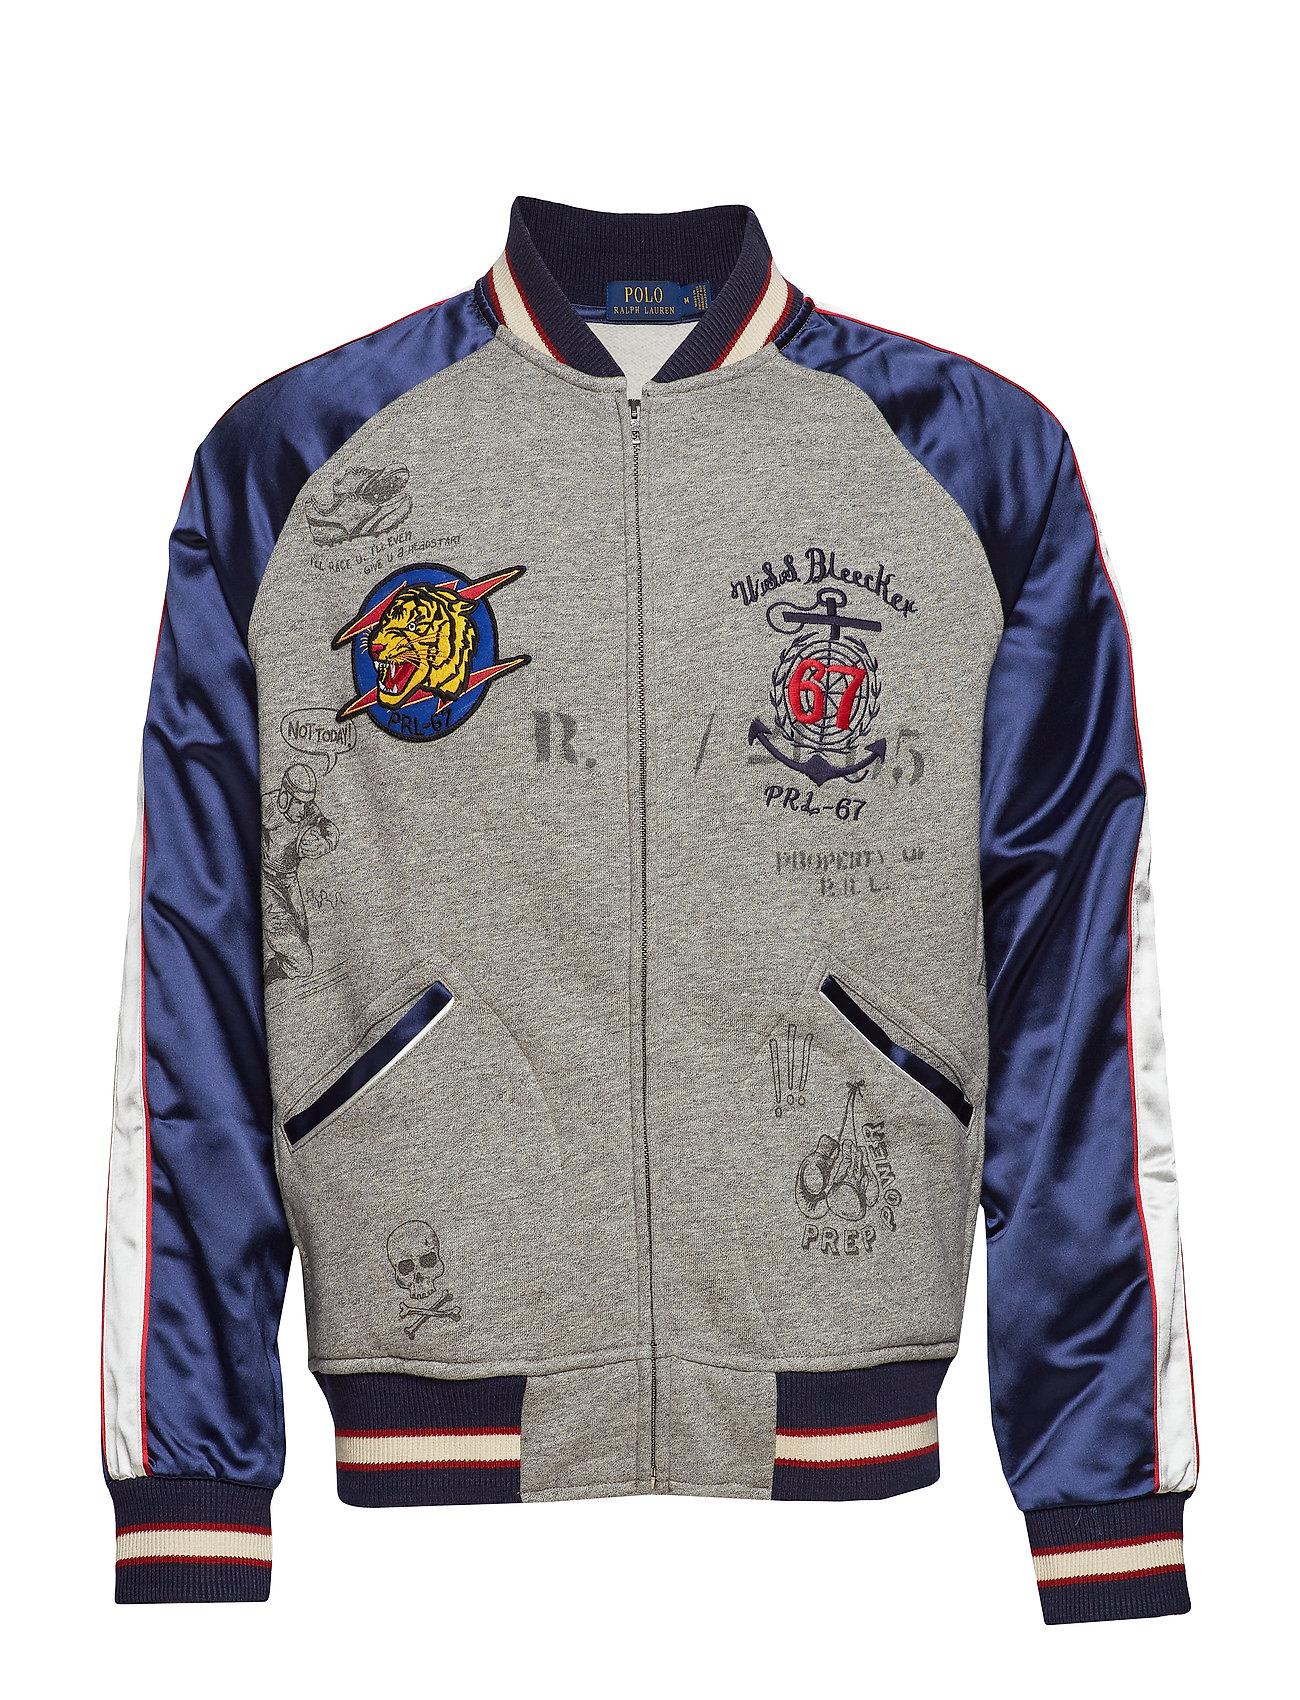 Polo Ralph Lauren Souvenir Baseball Jacket